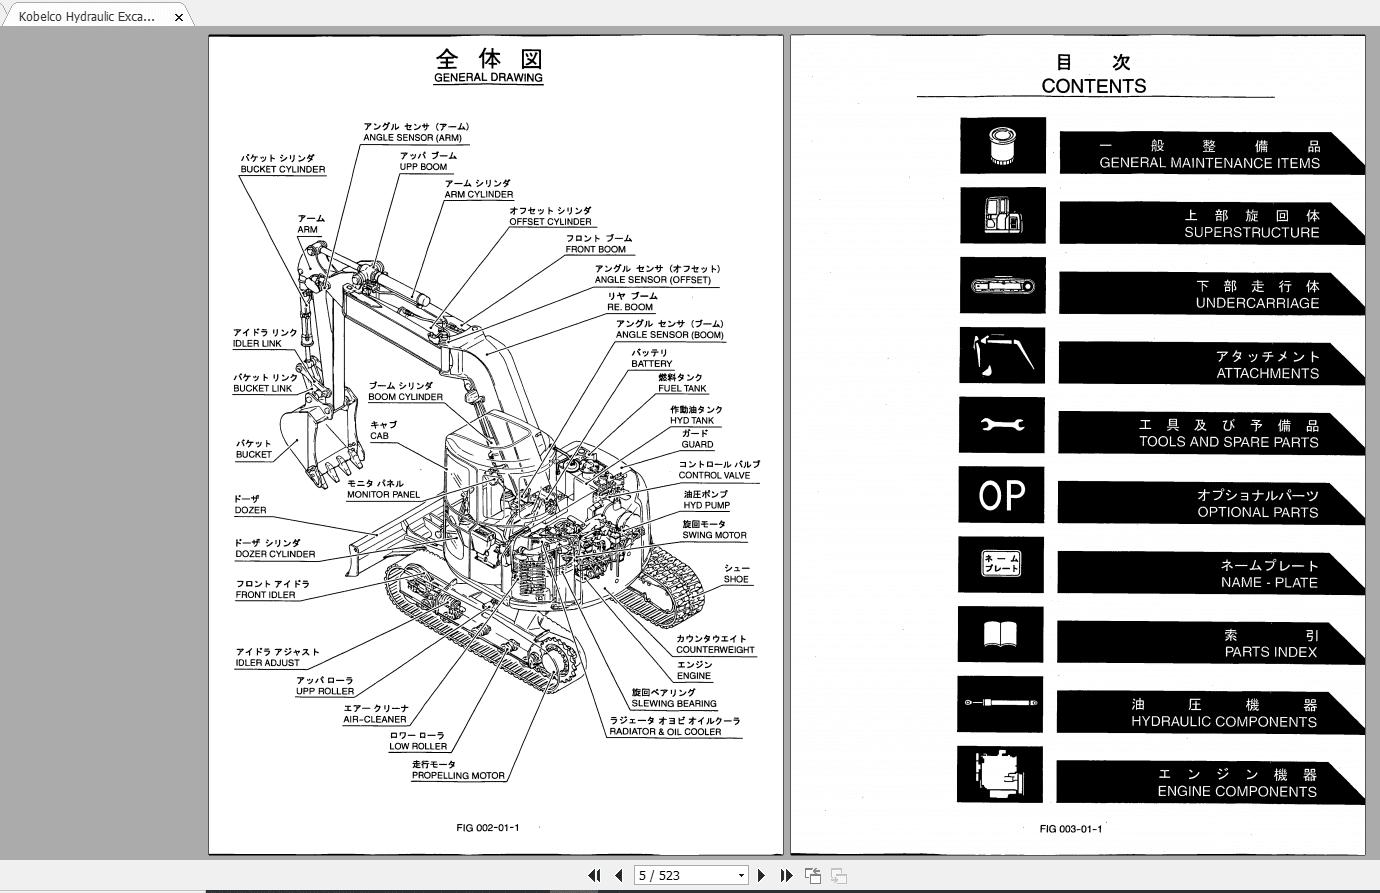 Kobelco_Hydraulic_Excavator_SK75UR-3E_S3YR00002ZJ06_Parts_Catalog_2